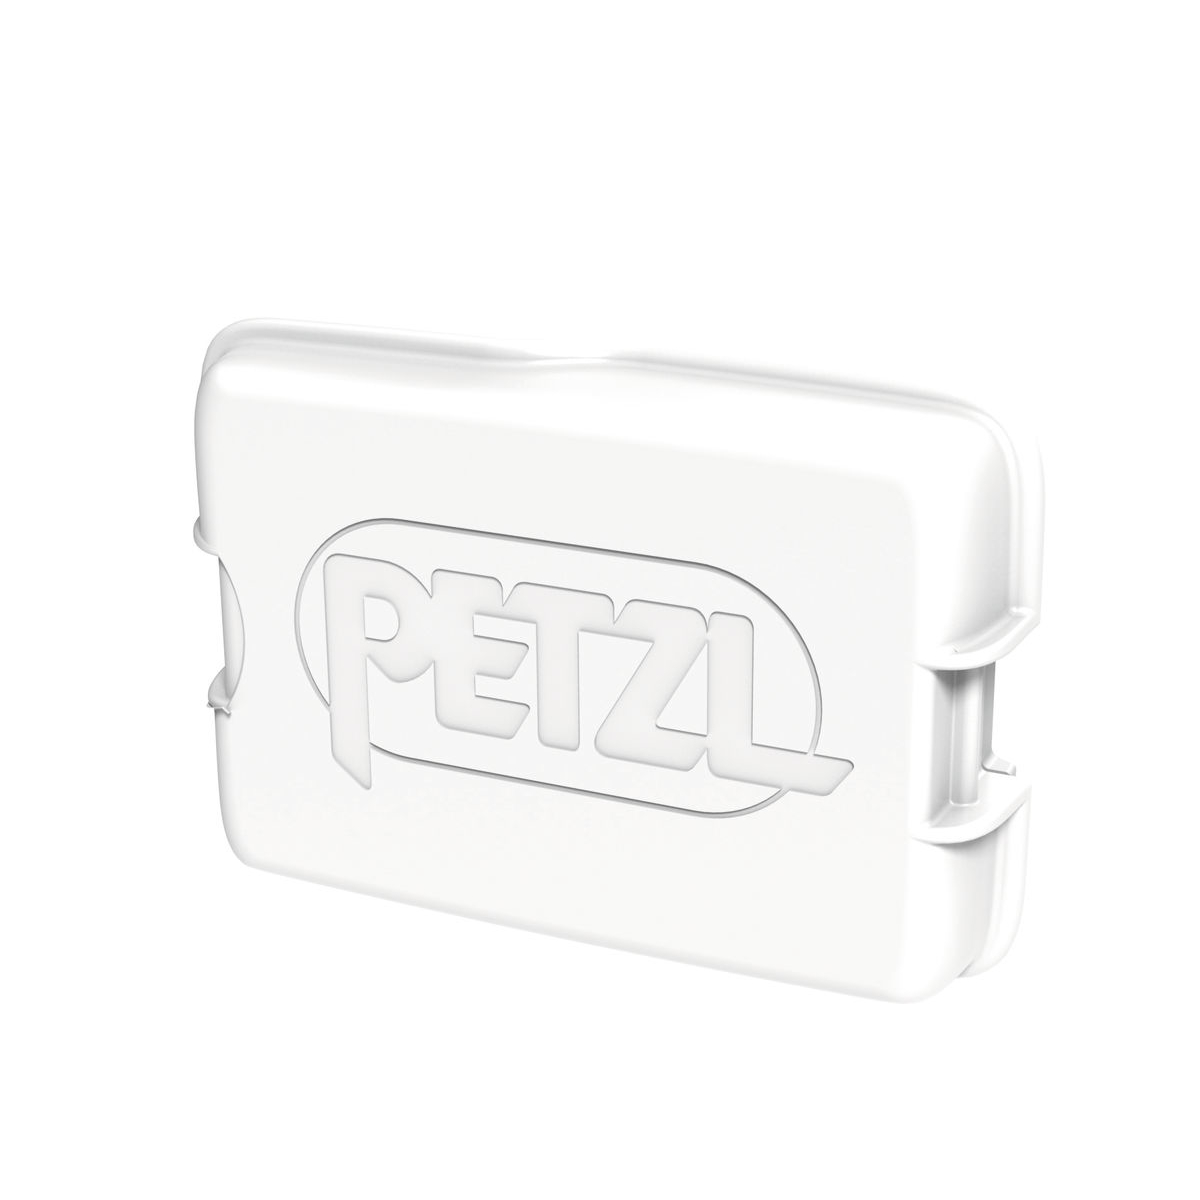 Petzl Accu Swift Rl Spare Battery Inglesport